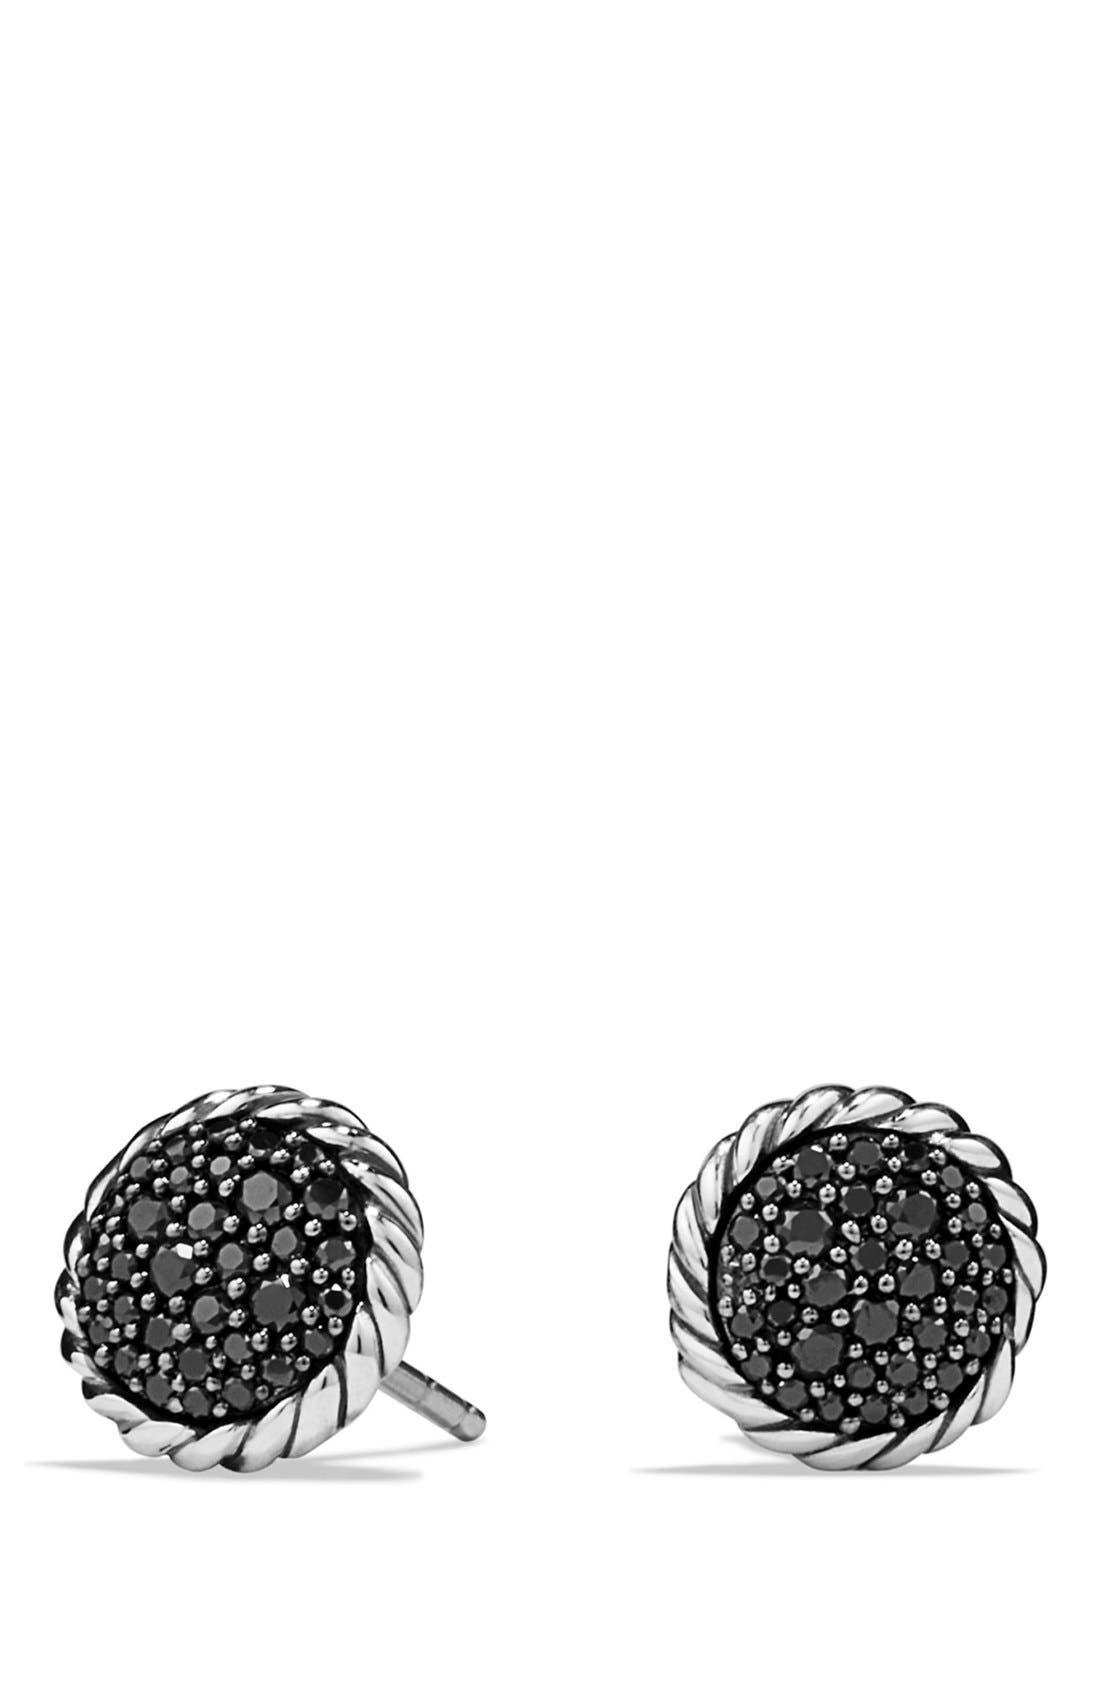 DAVID YURMAN Châtelaine Pavé Earring with Black Diamonds